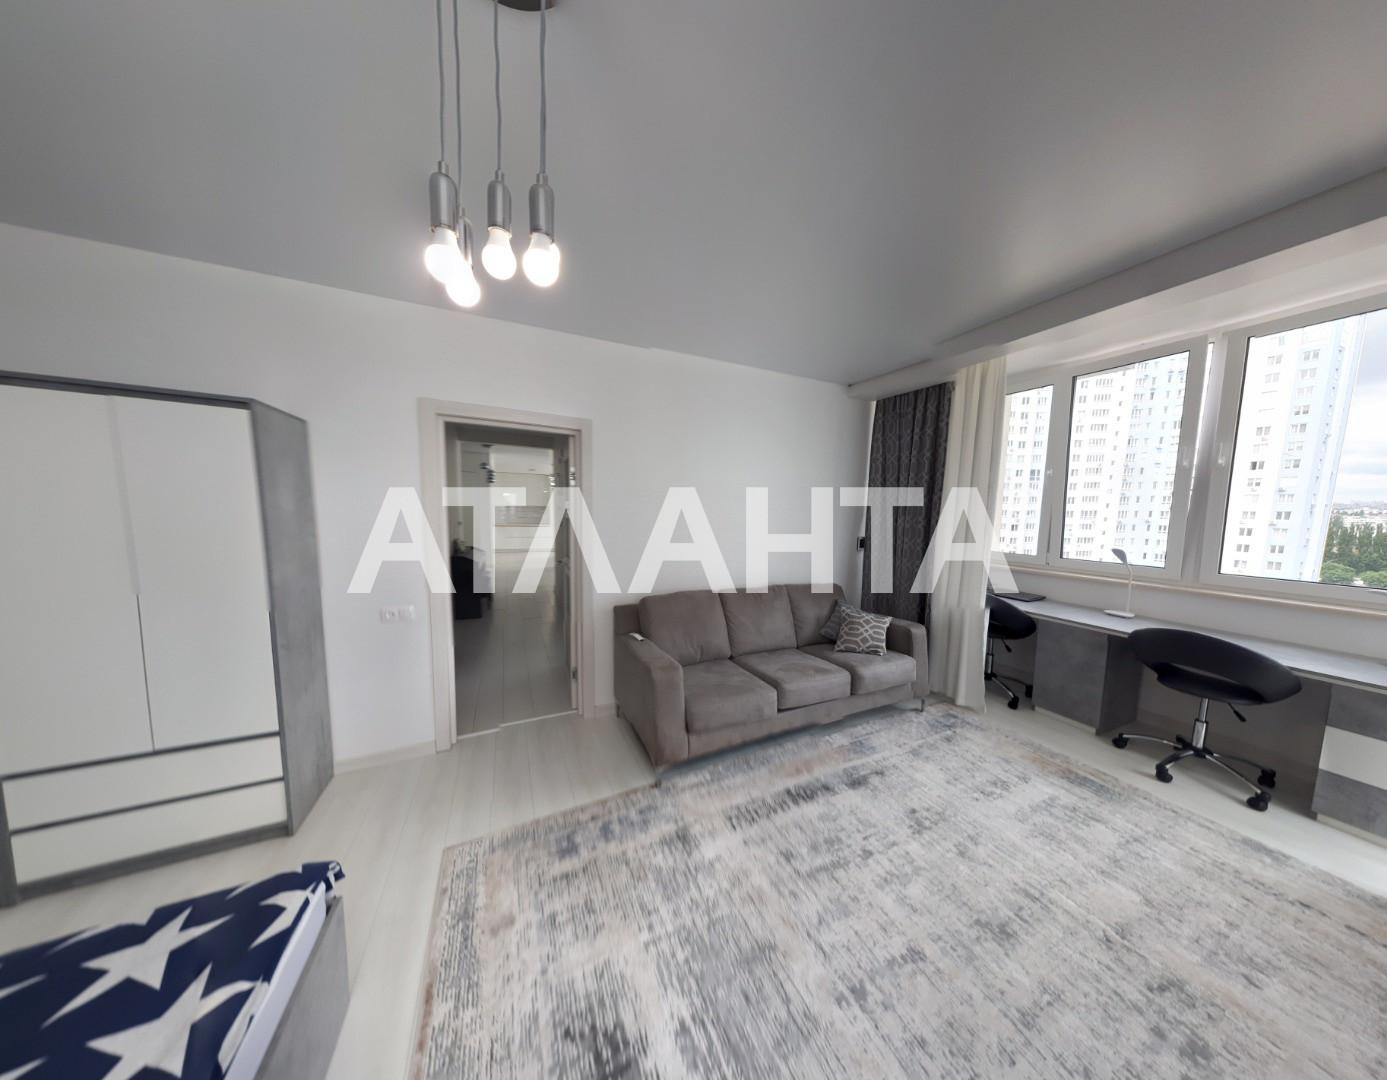 Продается 3-комнатная Квартира на ул. Просп. Глушкова — 160 000 у.е. (фото №2)